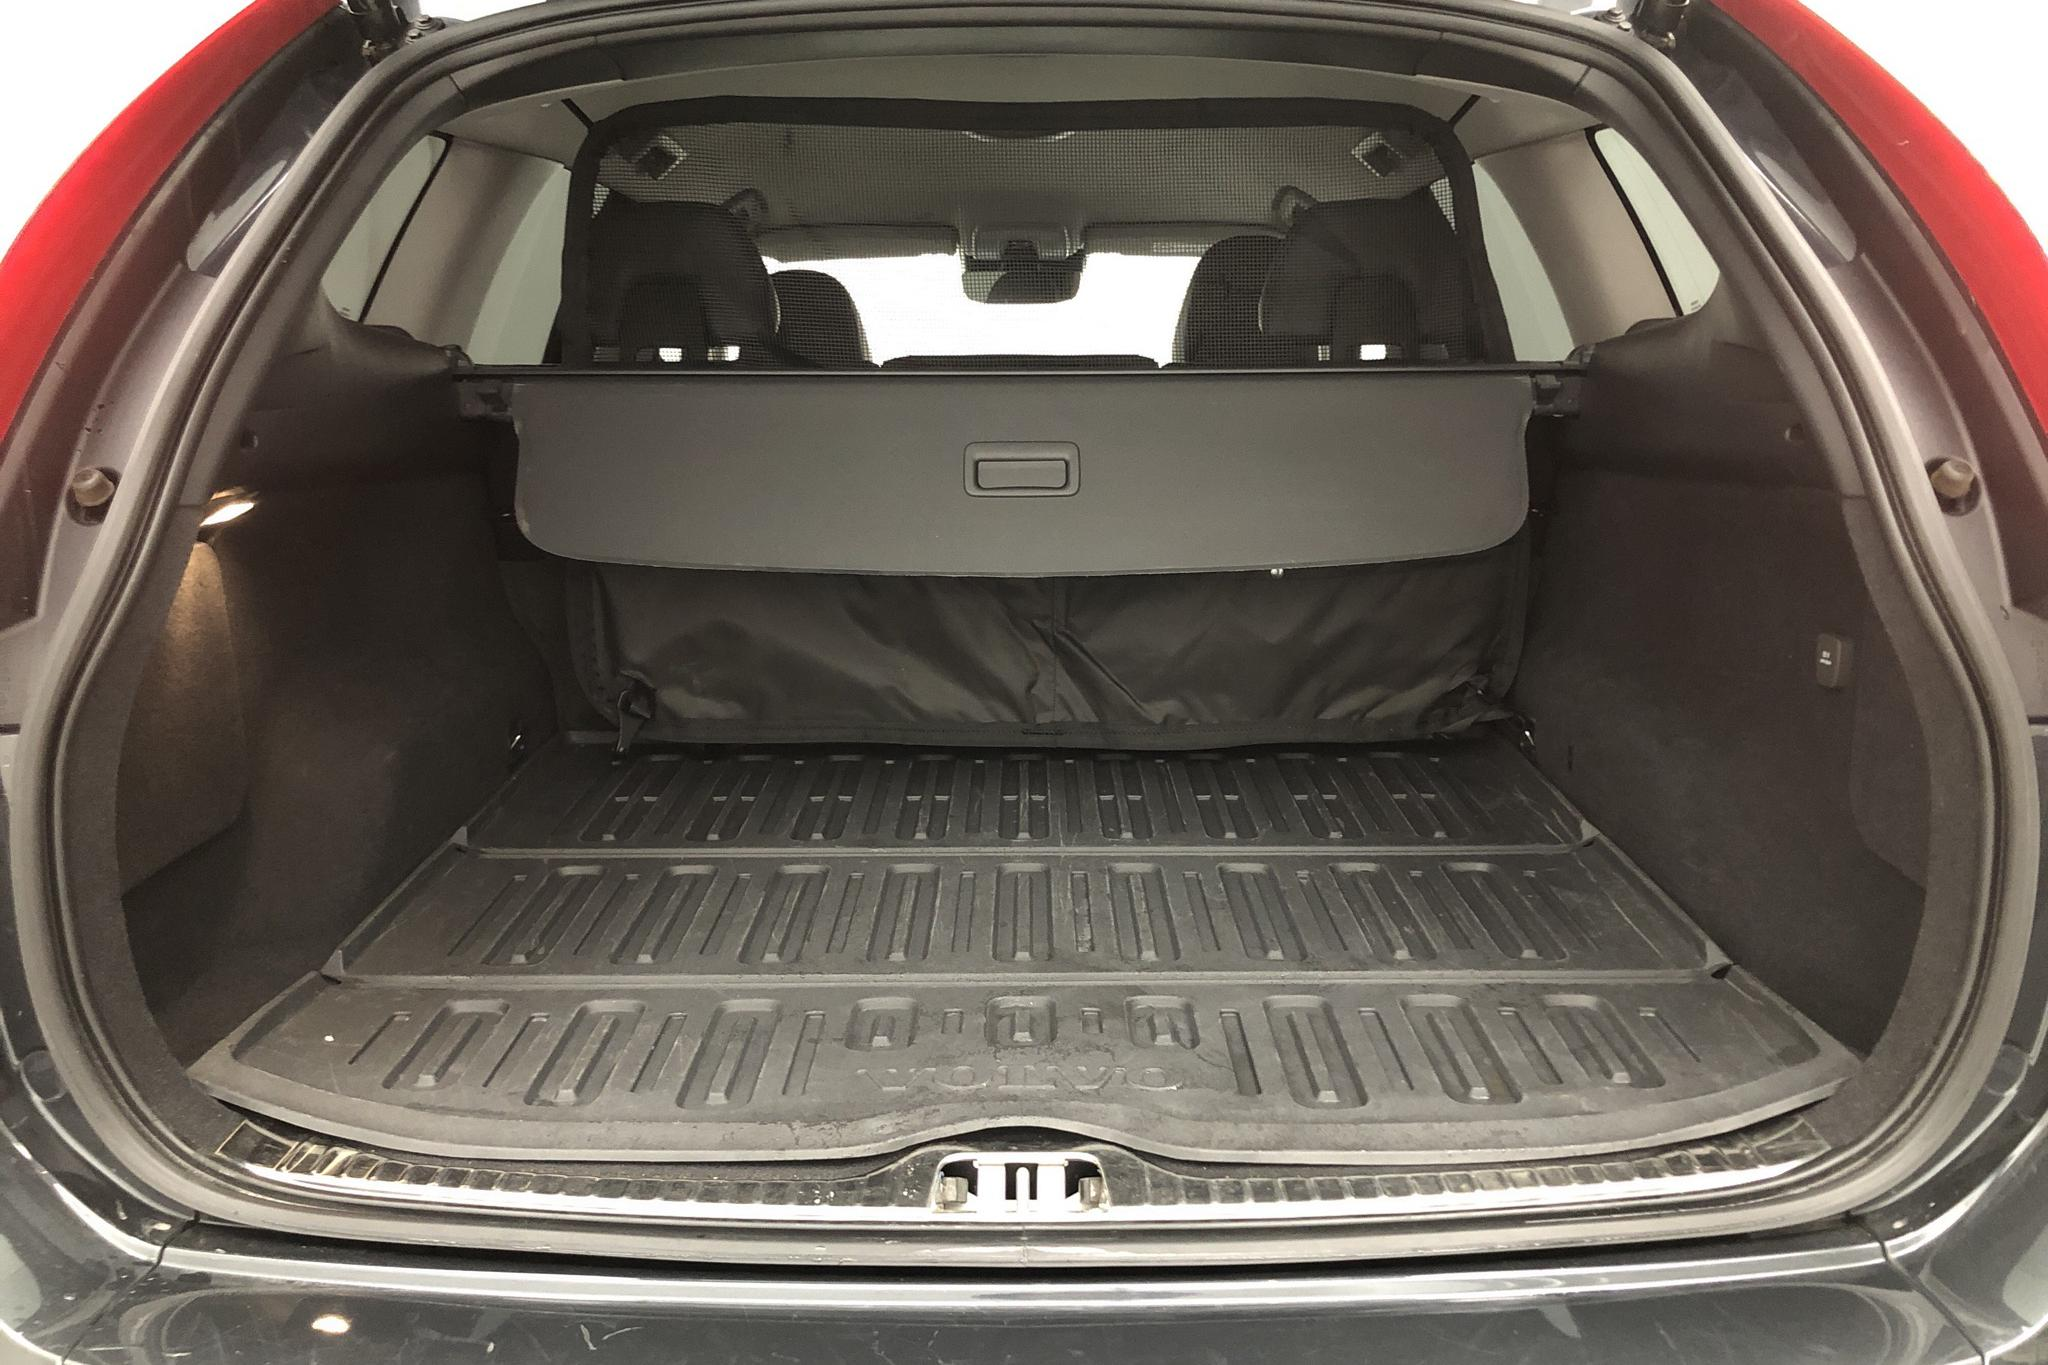 Volvo XC60 D4 AWD (190hk) - 3 167 mil - Automat - grå - 2017